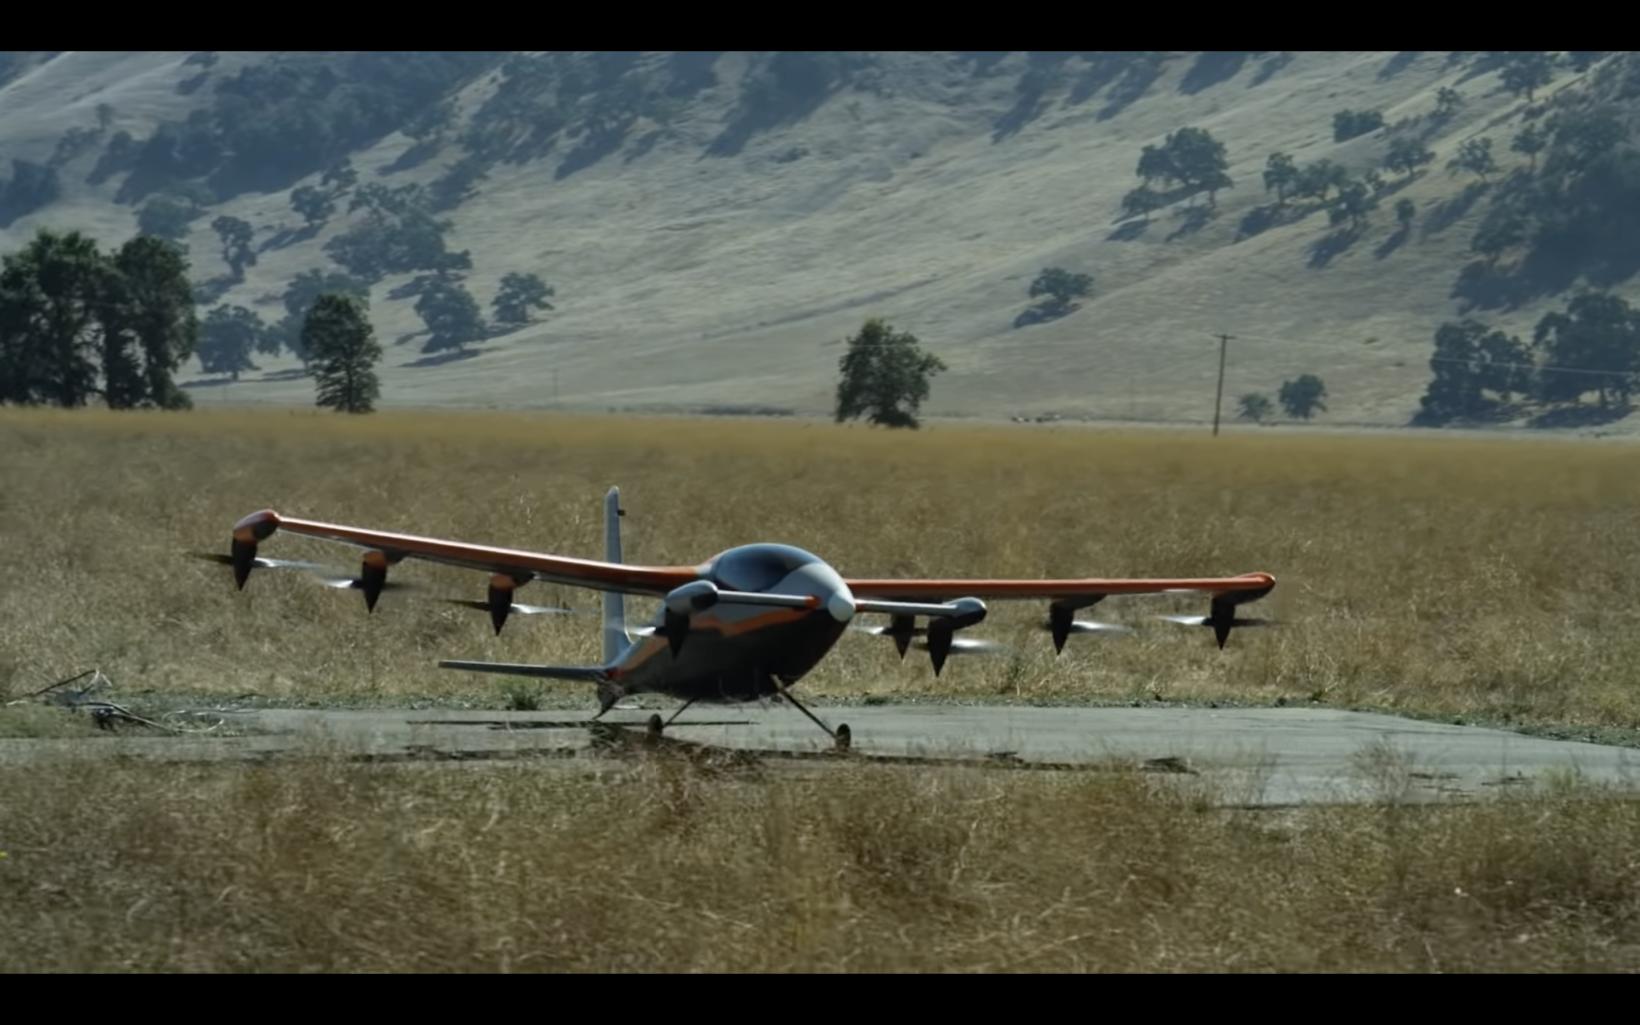 the kitty hawk aircraft and landing pad